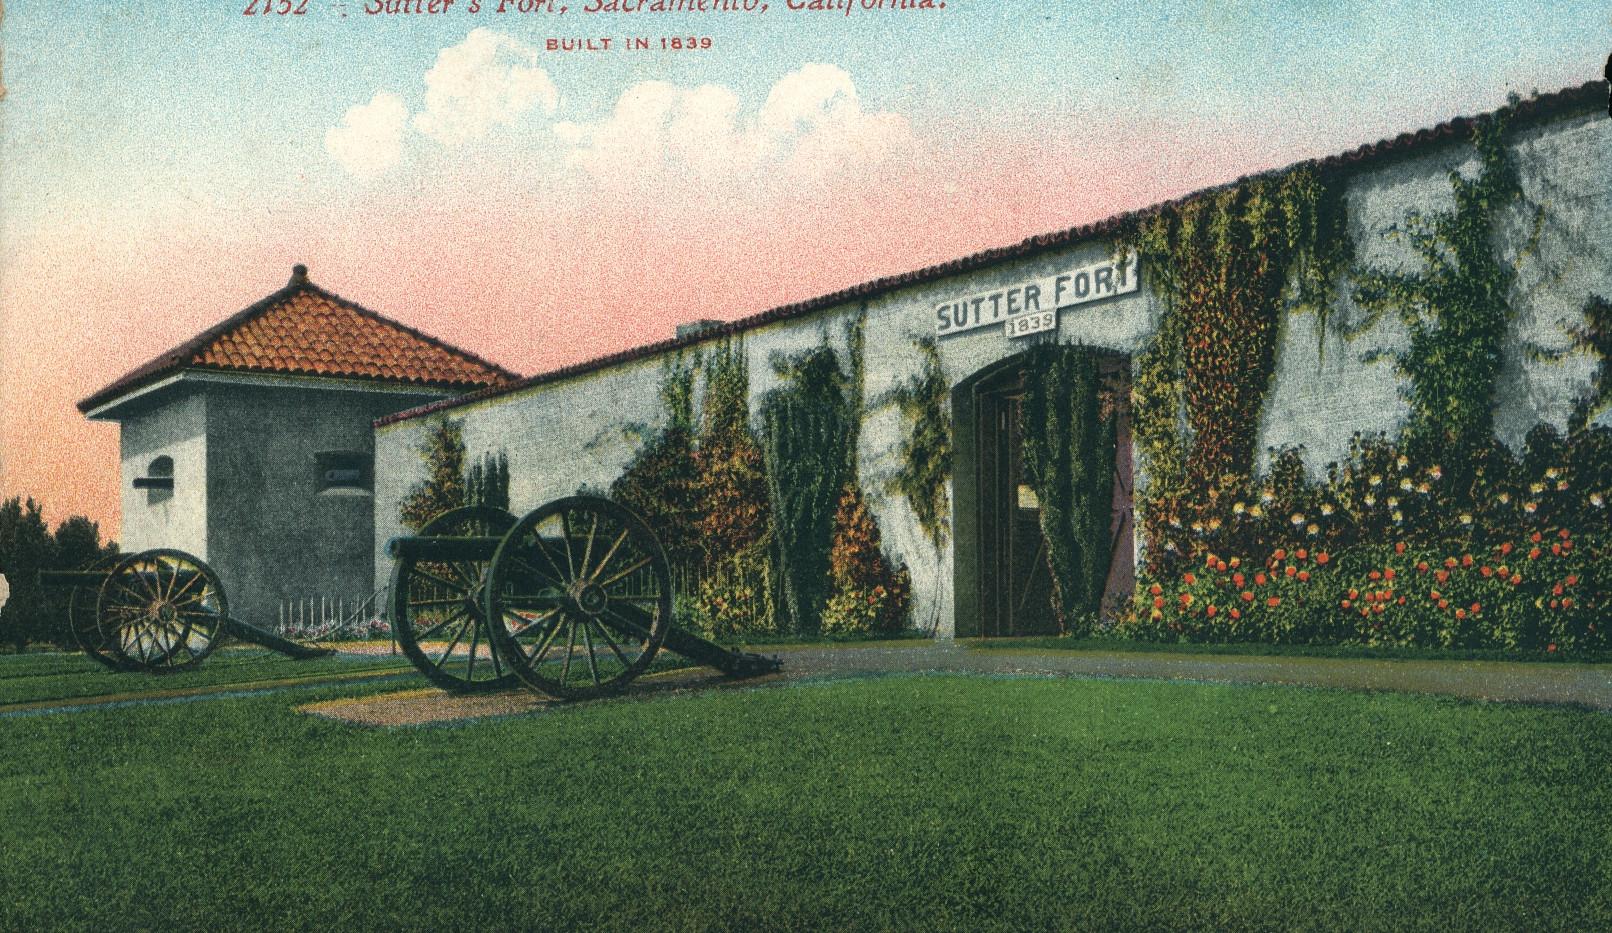 Sutter's Fort, Sacramento, California